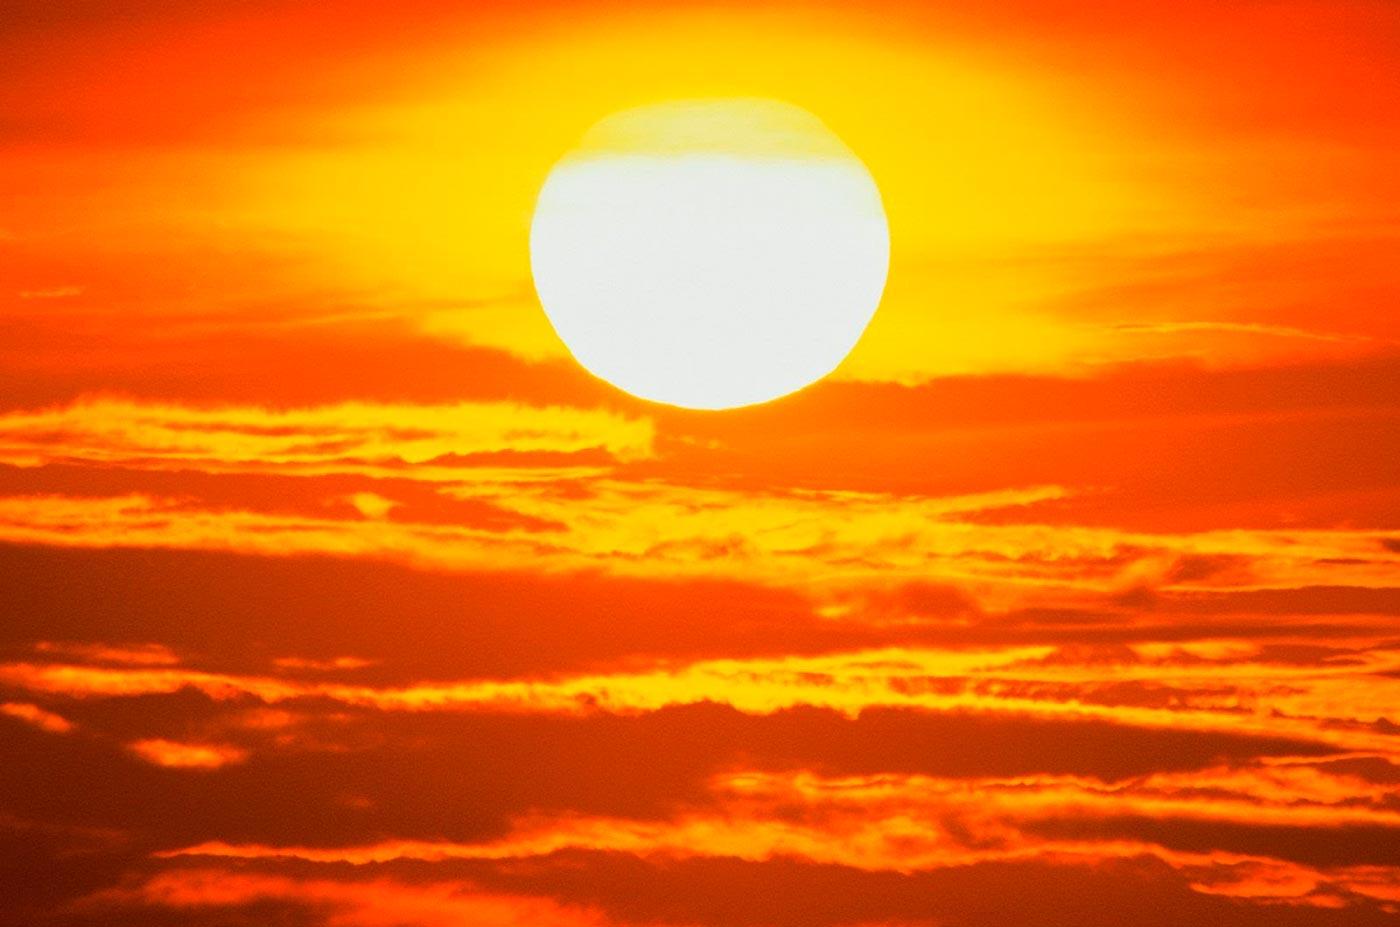 Будет ли это лето в Узбекистане таким же жарким